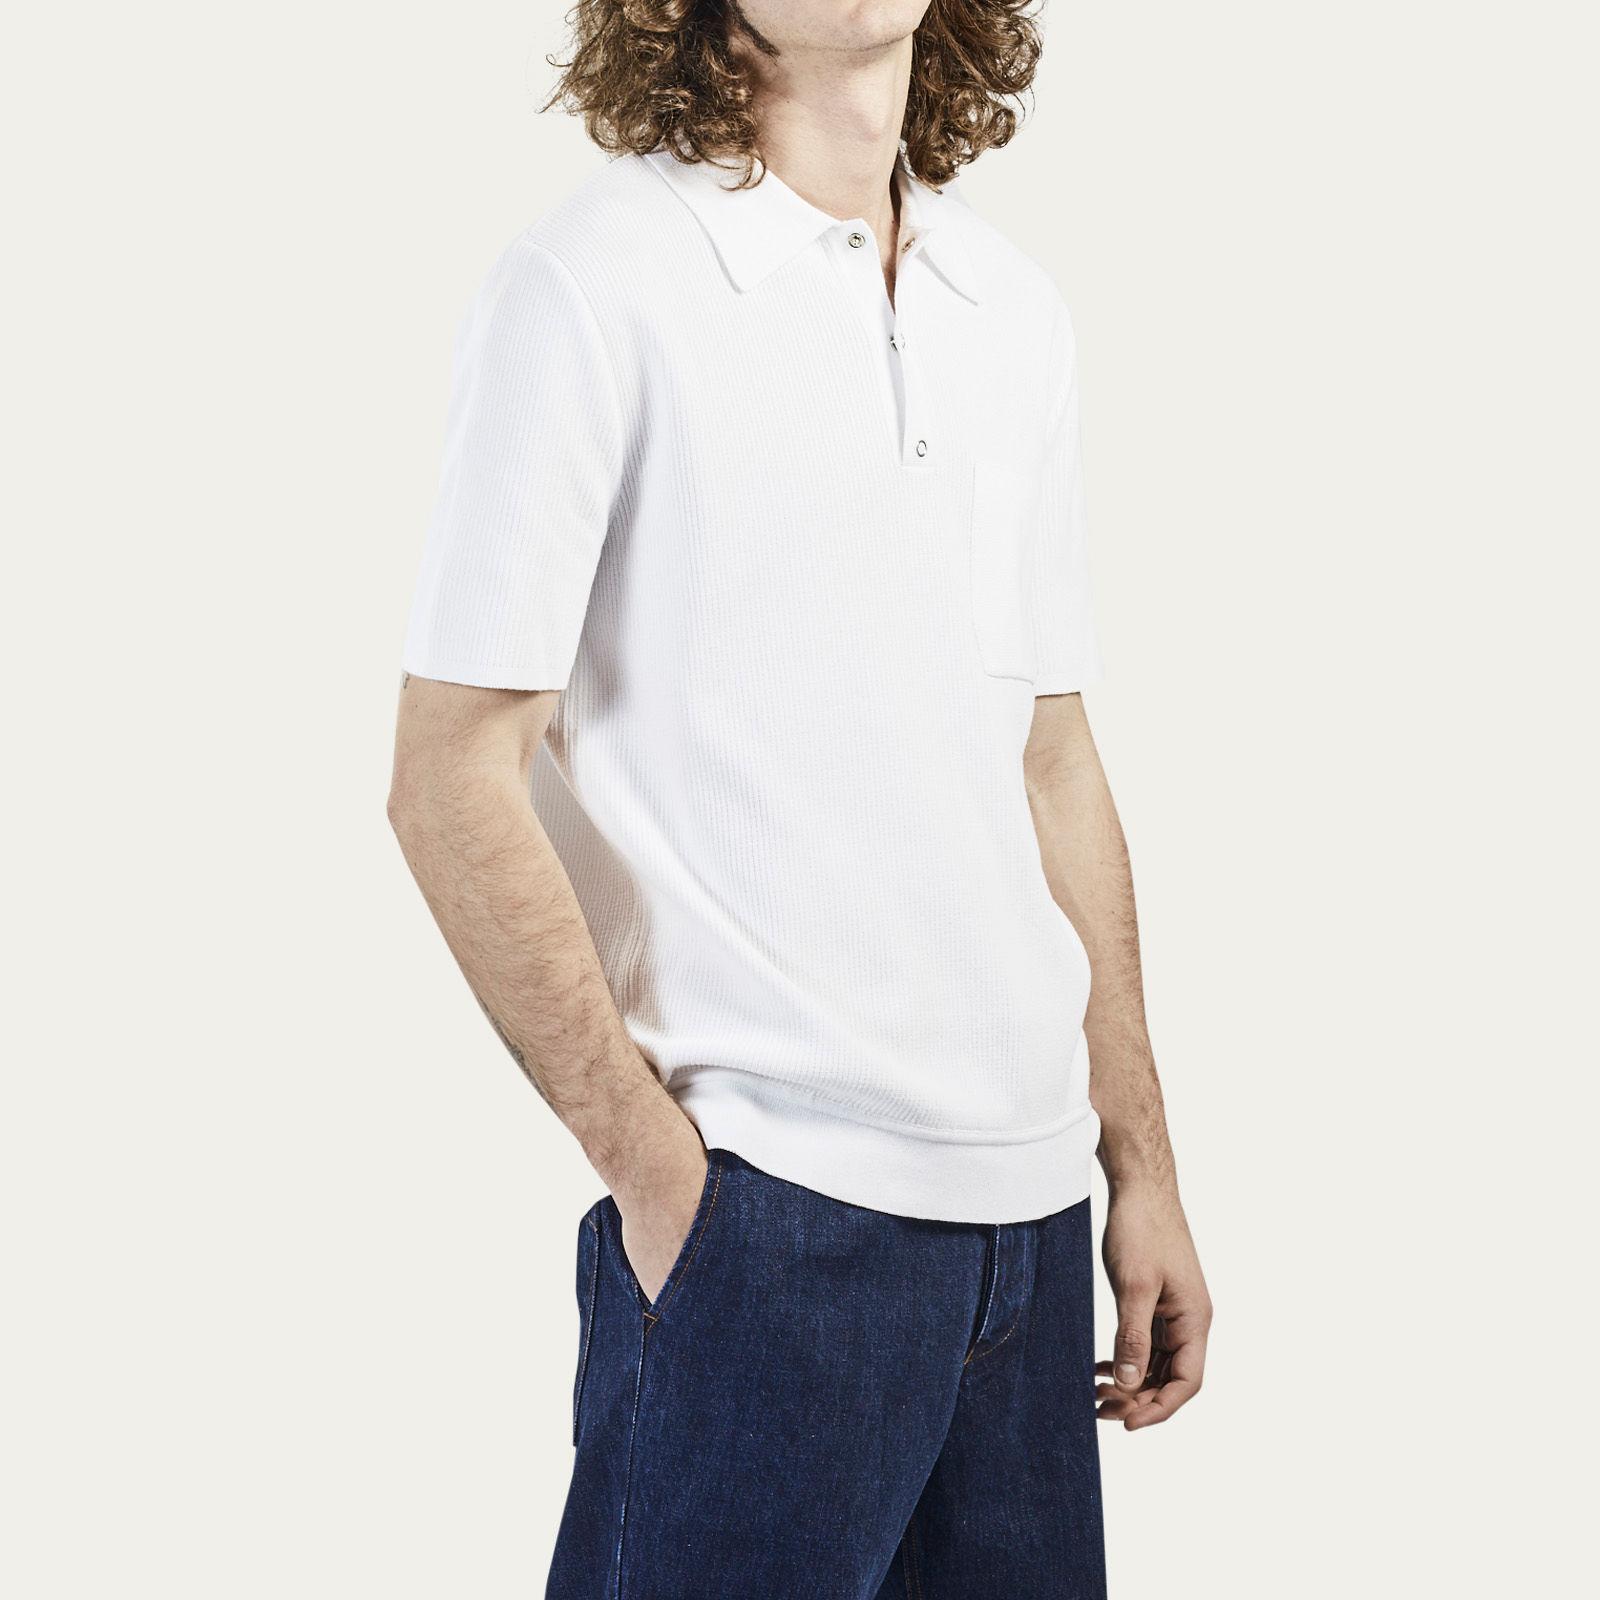 Big Sur White Polo Shirt | Bombinate